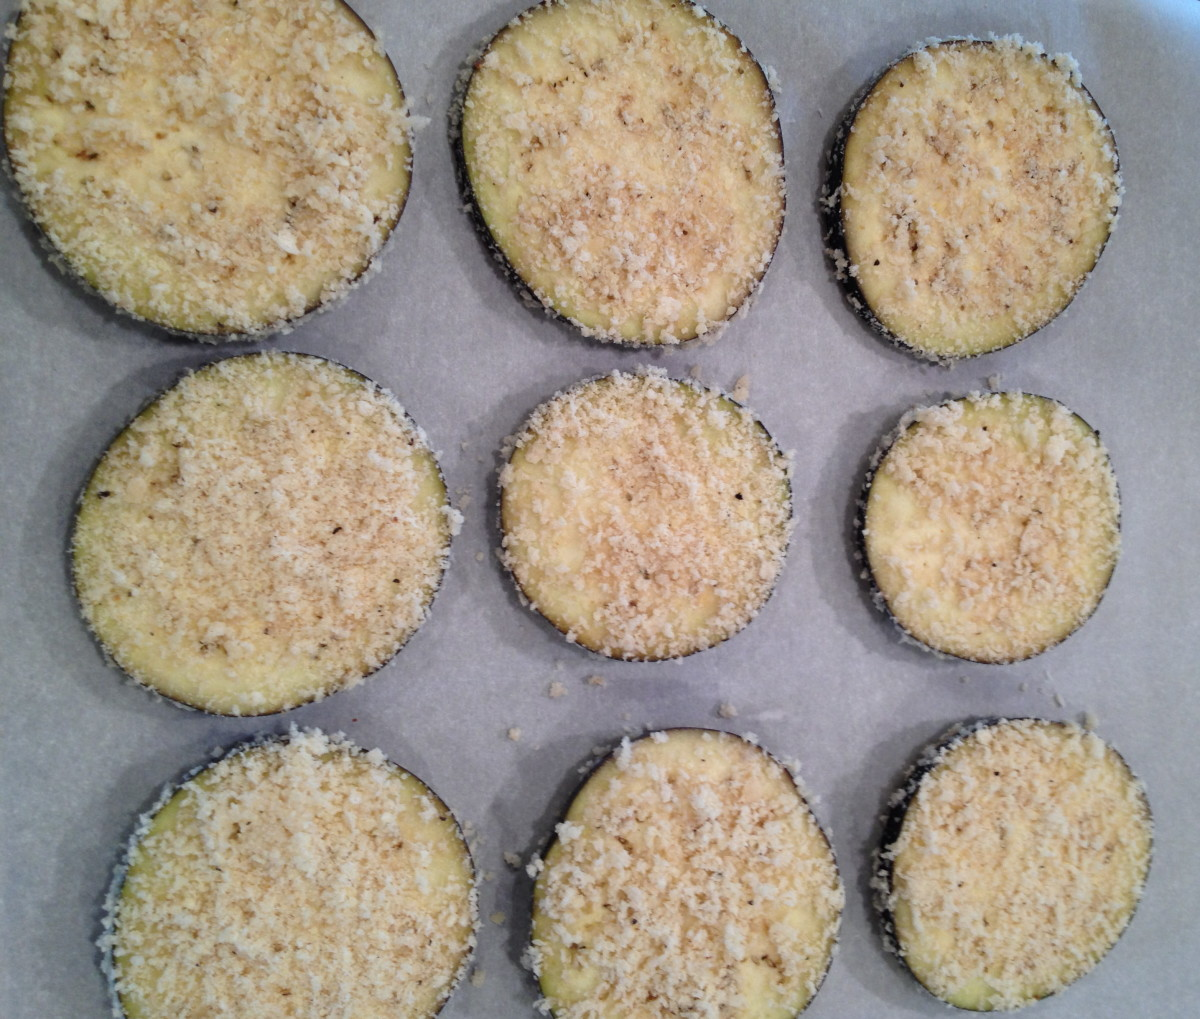 Arrange coated slices on a lined baking sheet.